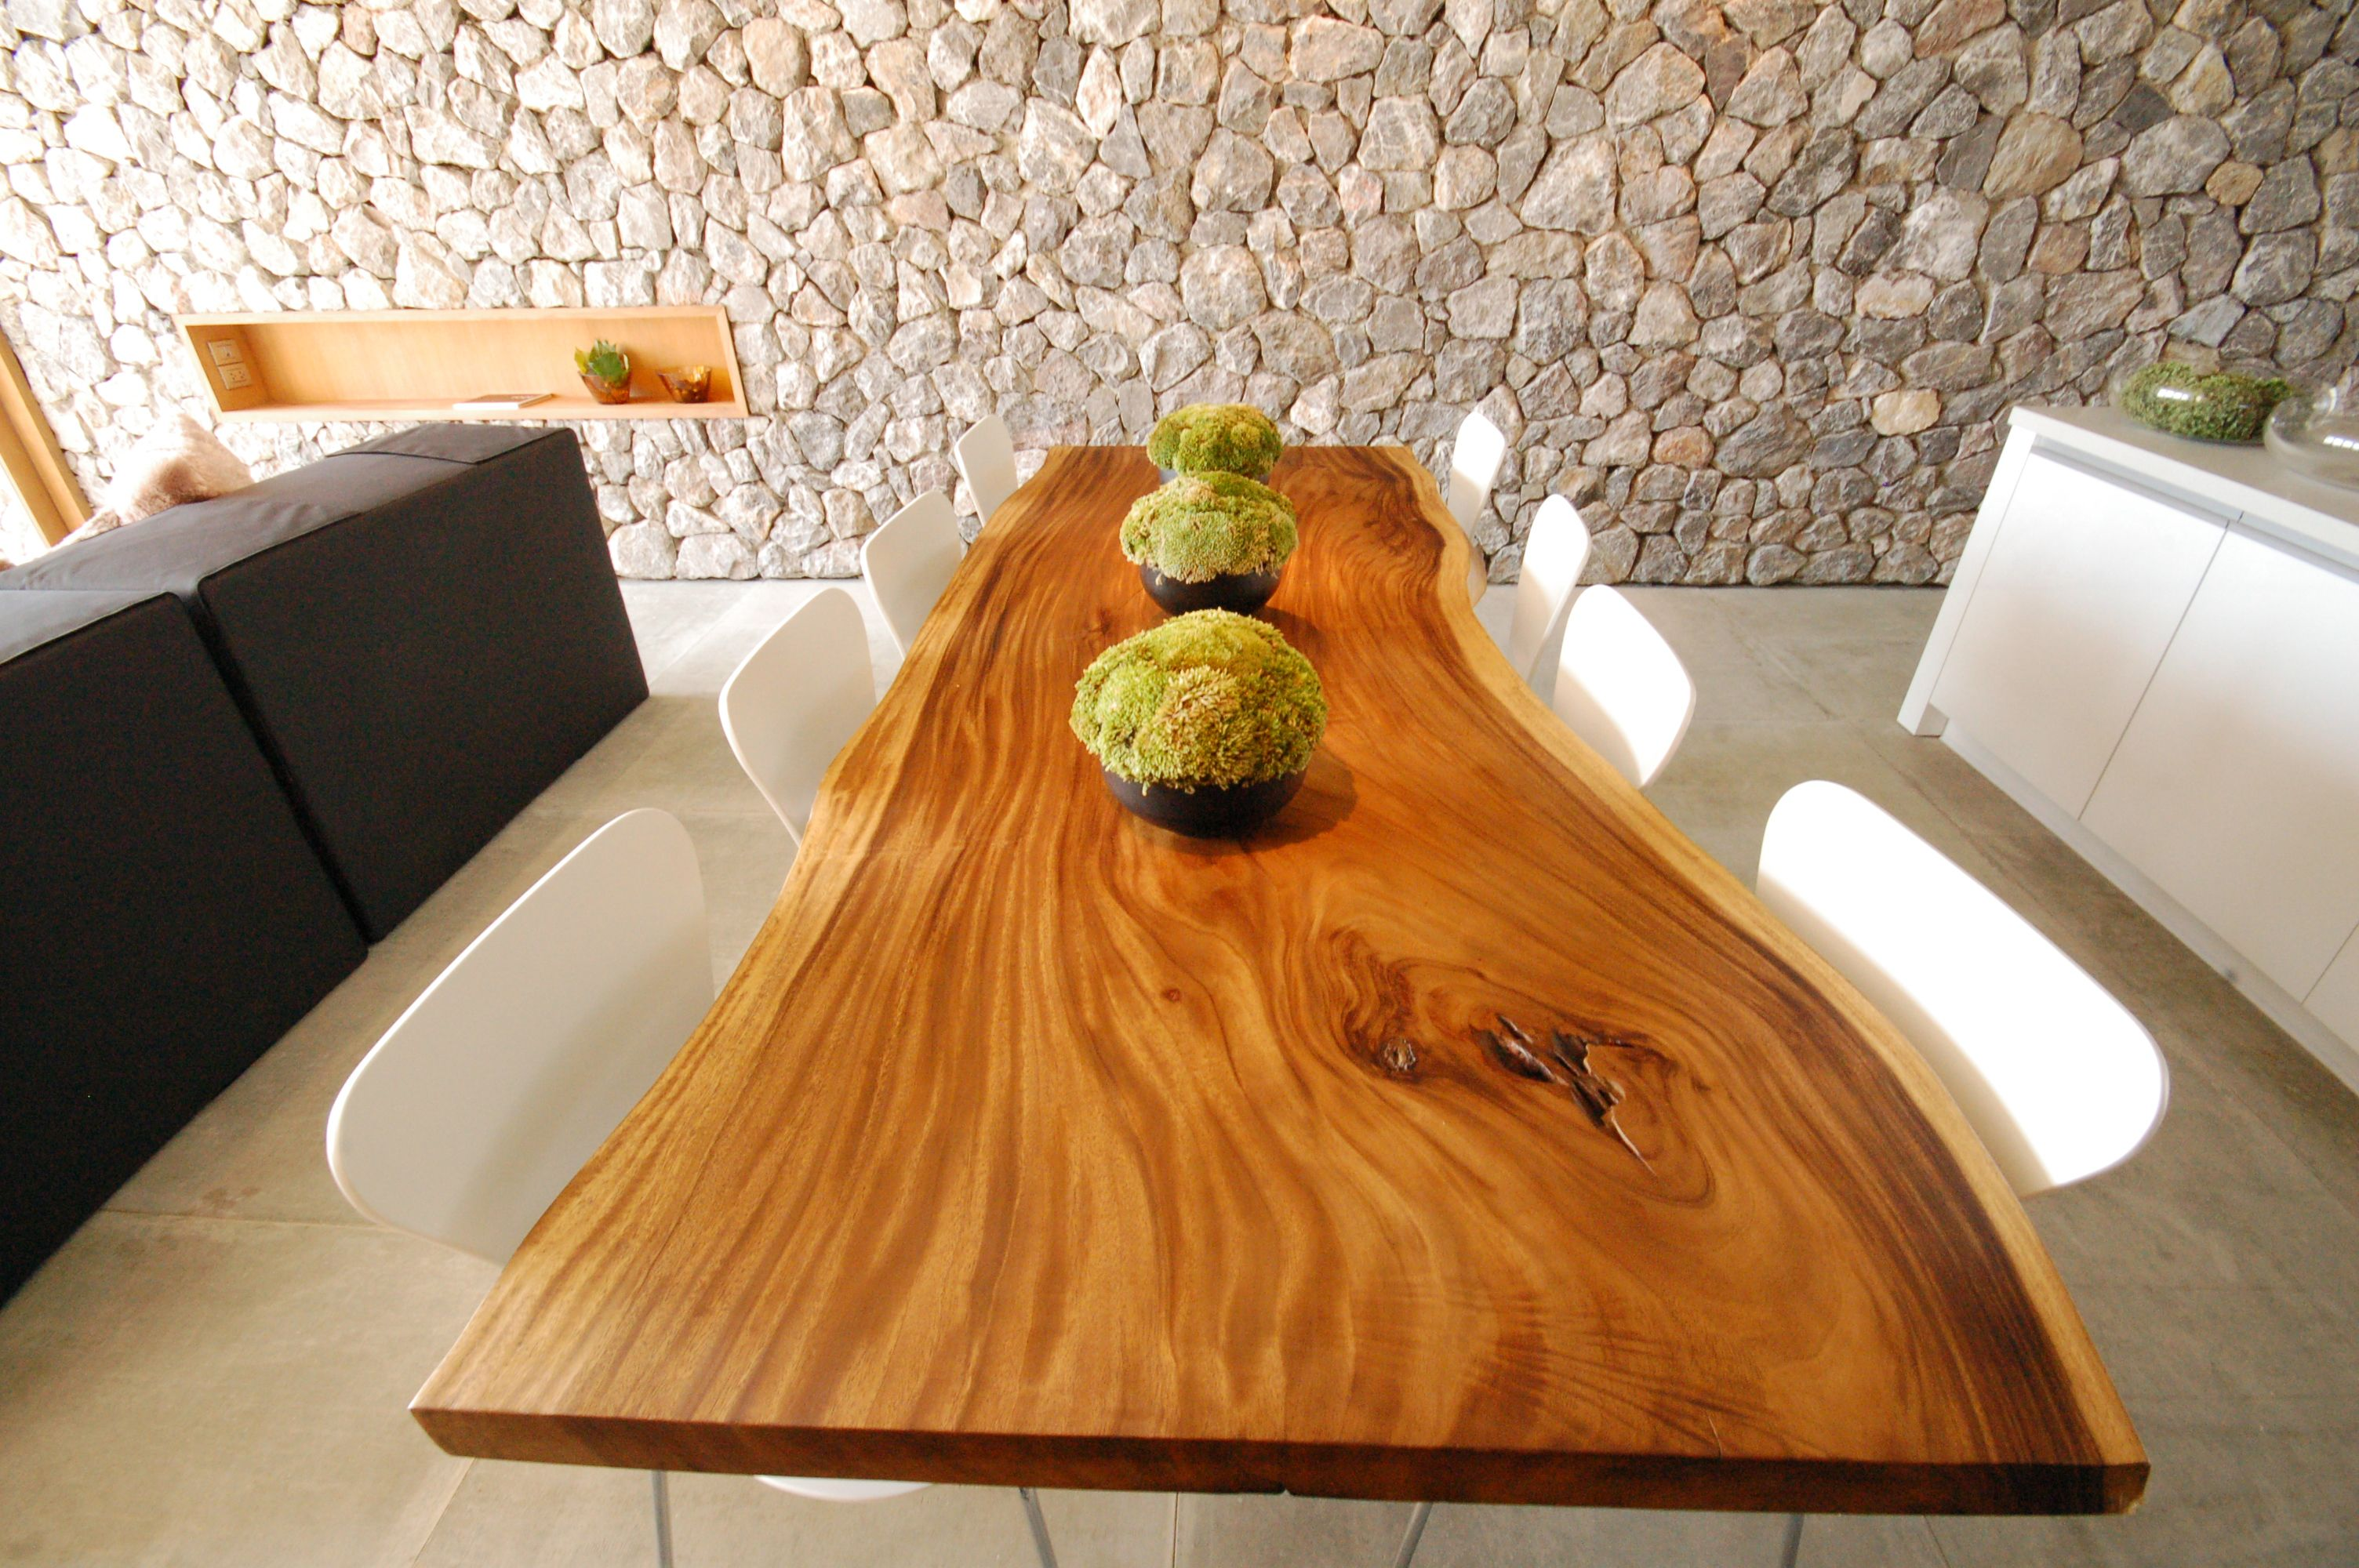 Bespoke hand made furniture of the highest standards